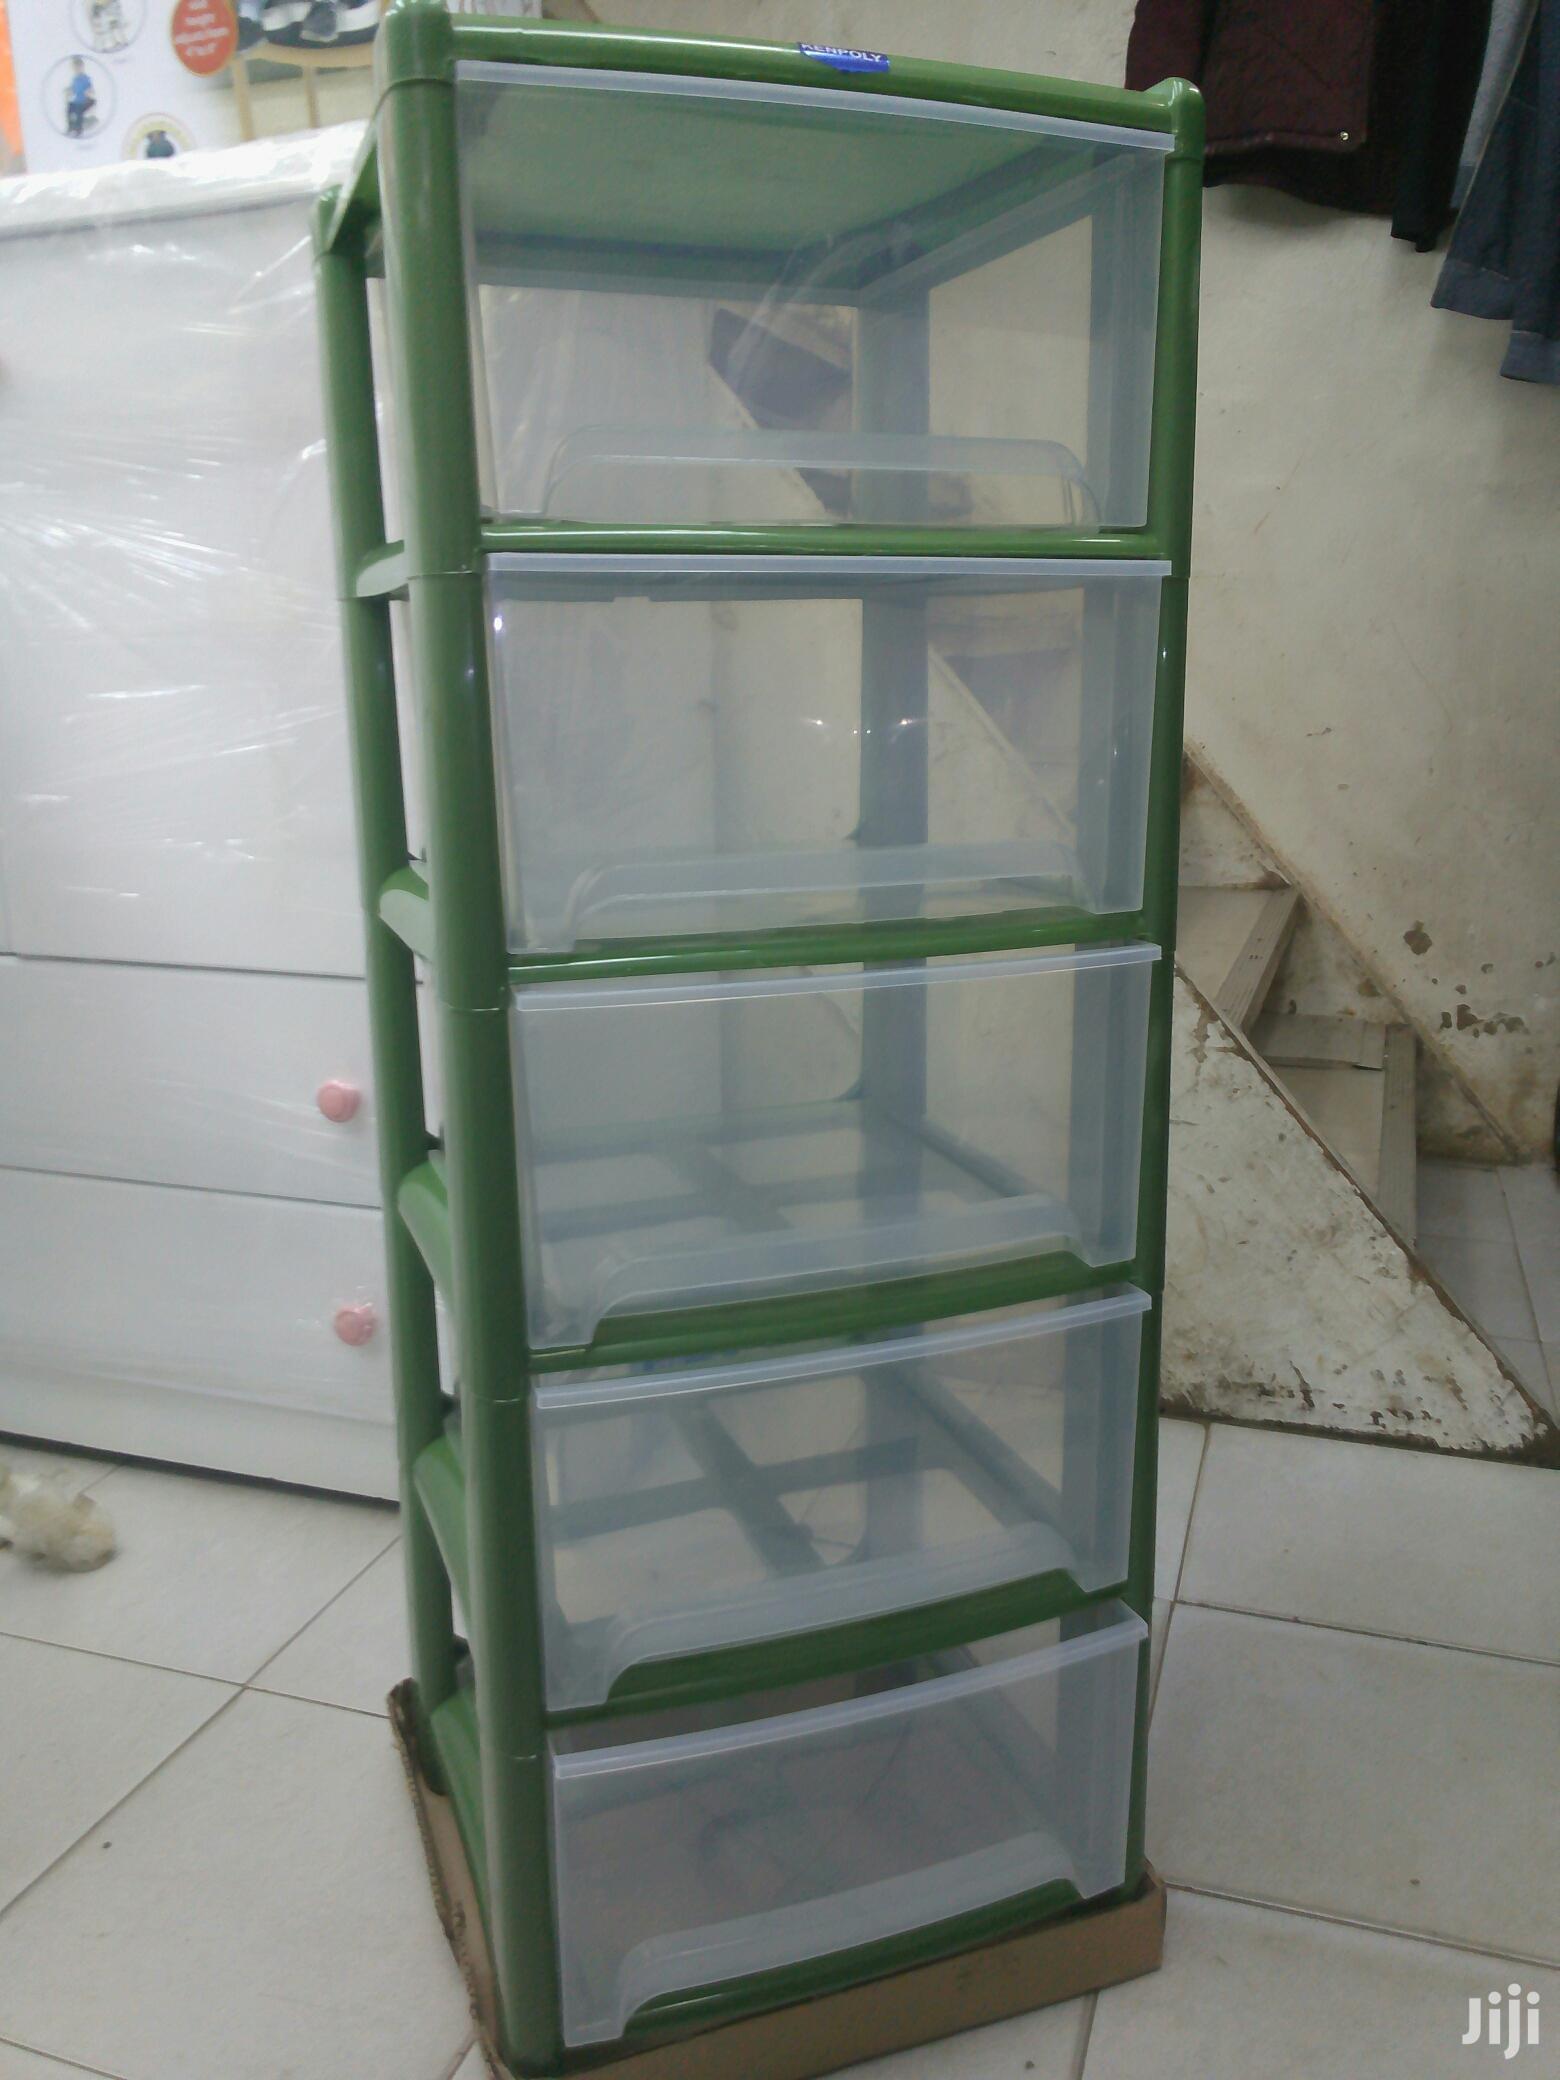 Storage Shelves | Children's Furniture for sale in Nairobi Central, Nairobi, Kenya